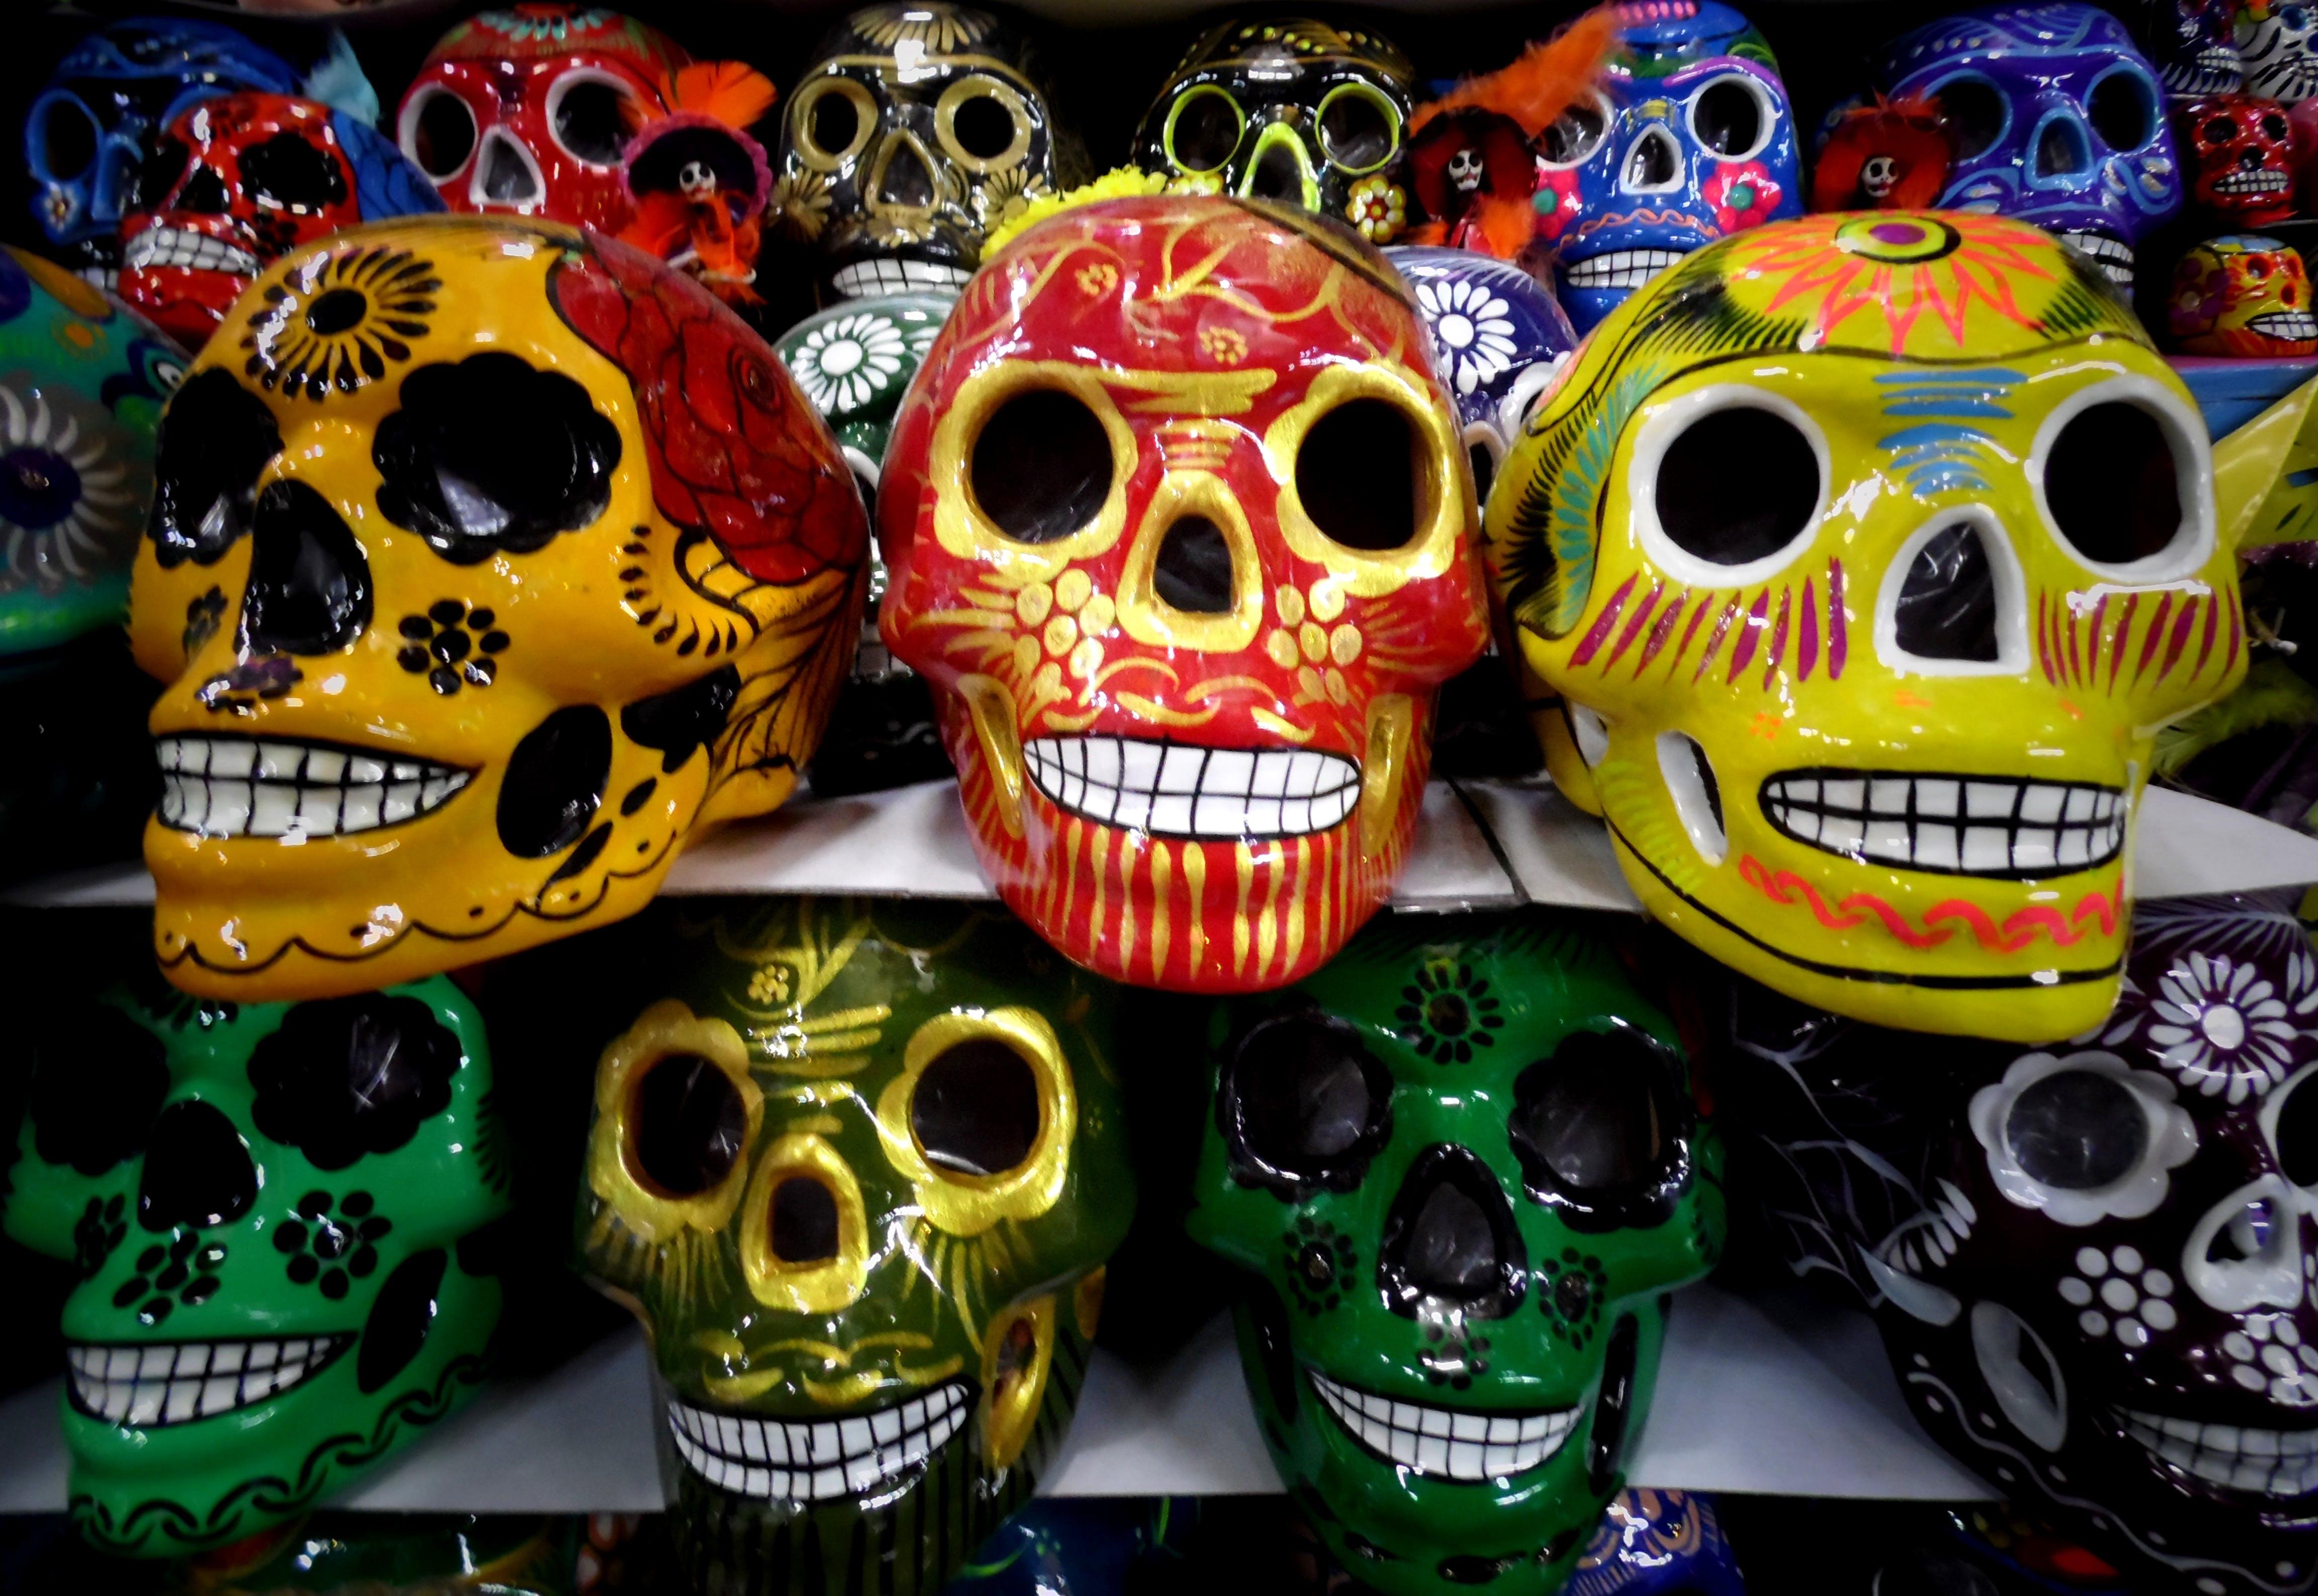 Seven Assorted-color Skullcandy Figurines